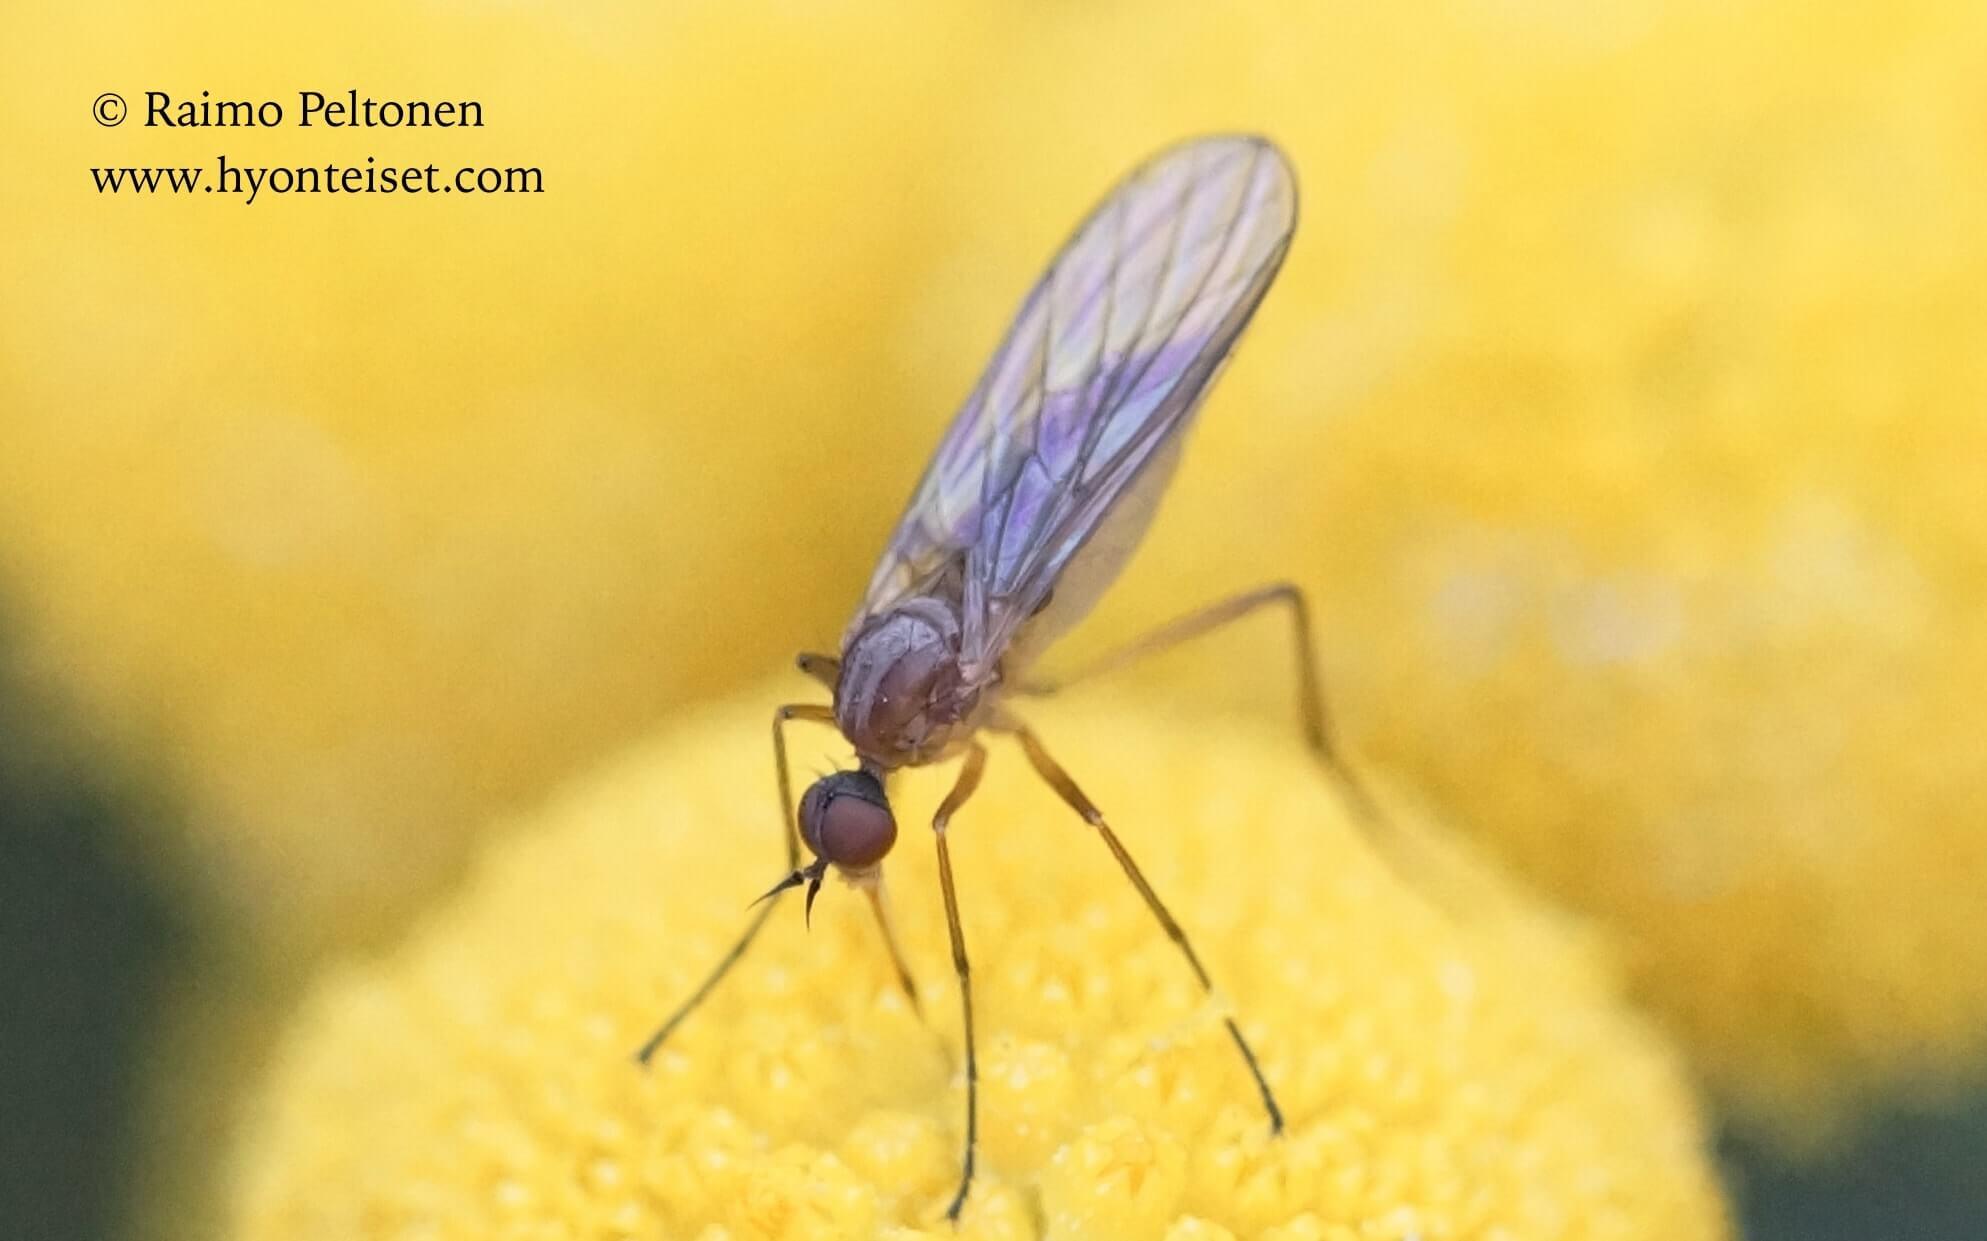 Rhampomyia sg. Holoclera (det. Paul Beuk)